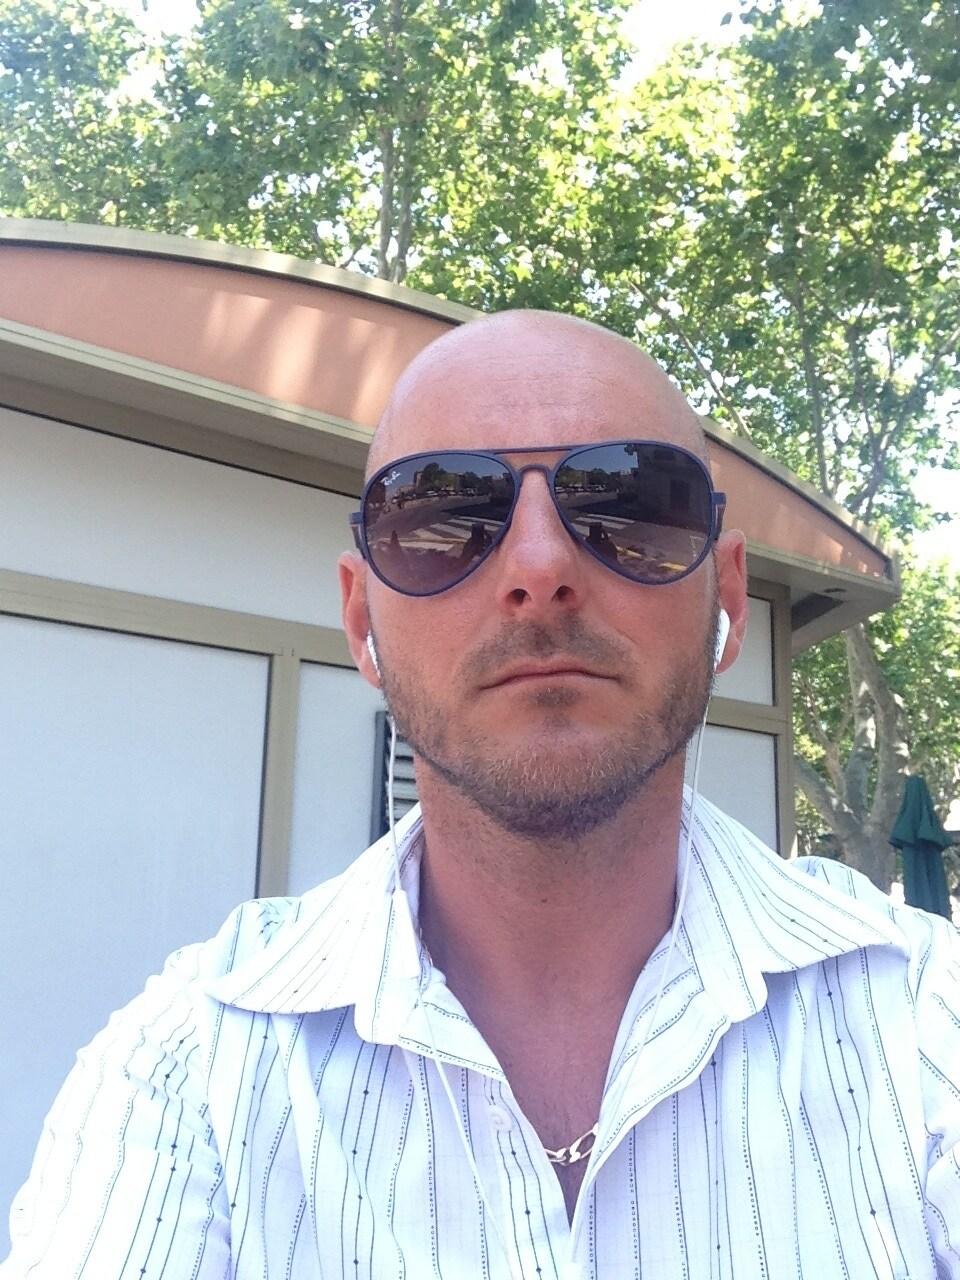 Jason from Balaruc-les-Bains